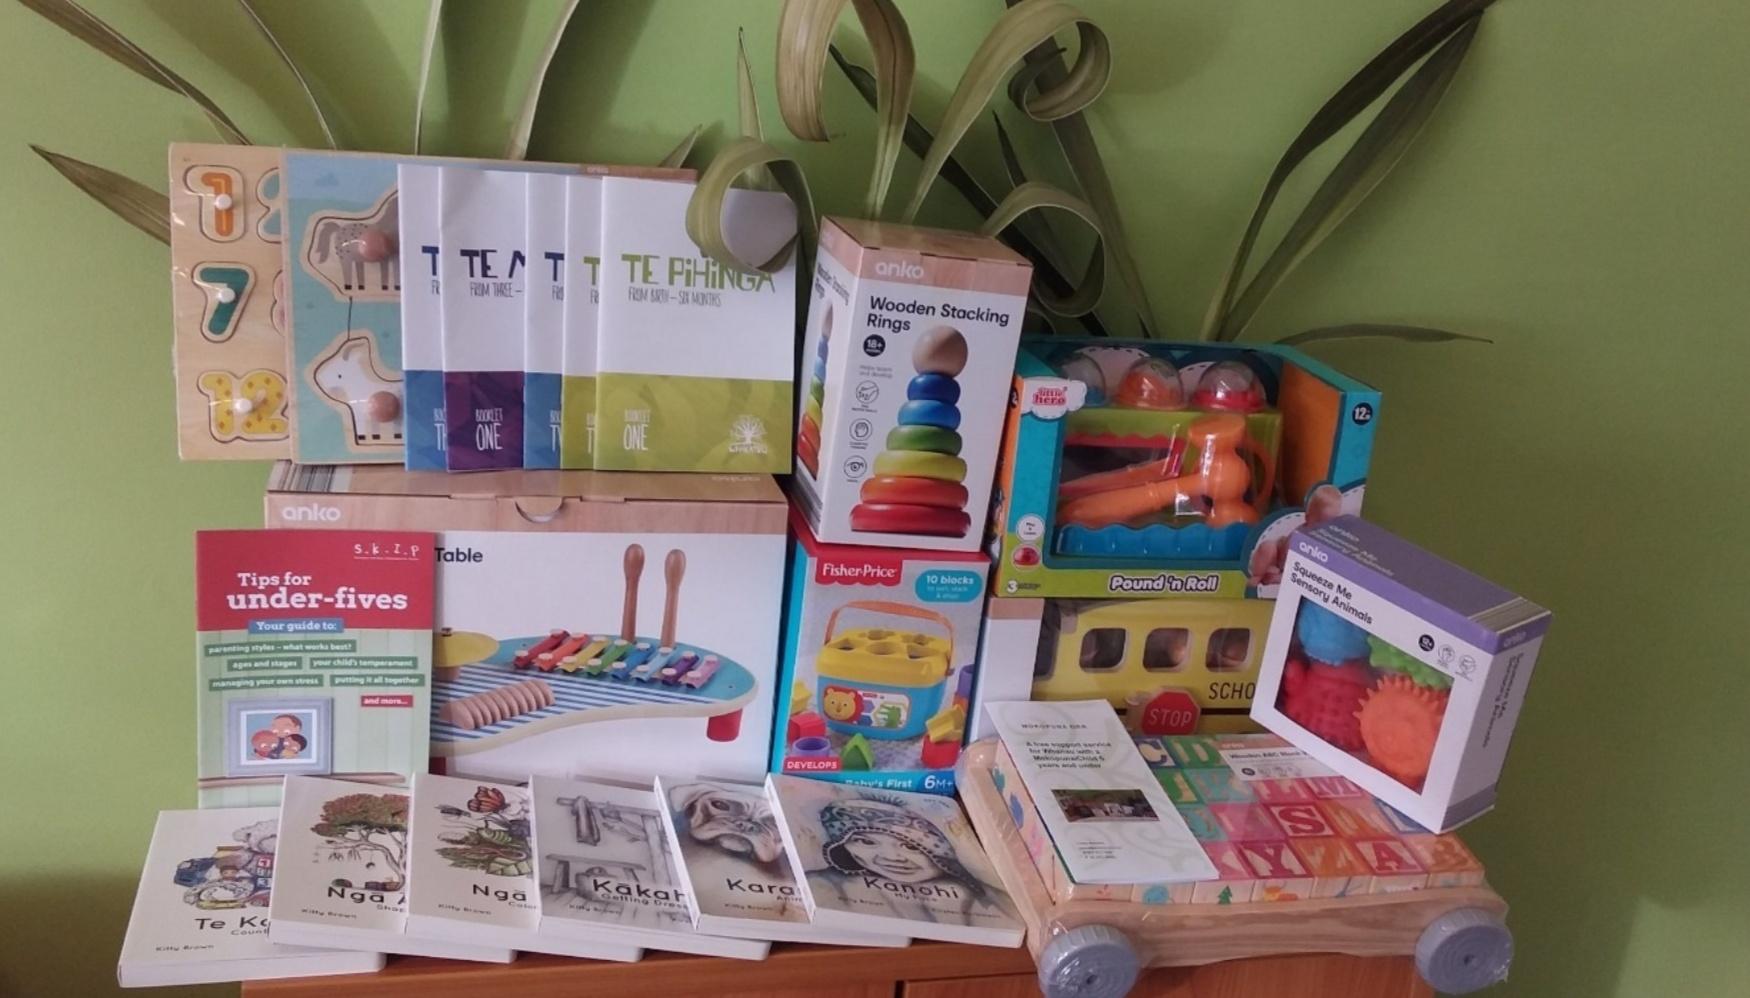 Resources gifted to whanau including Otakou created Reo Pepi books